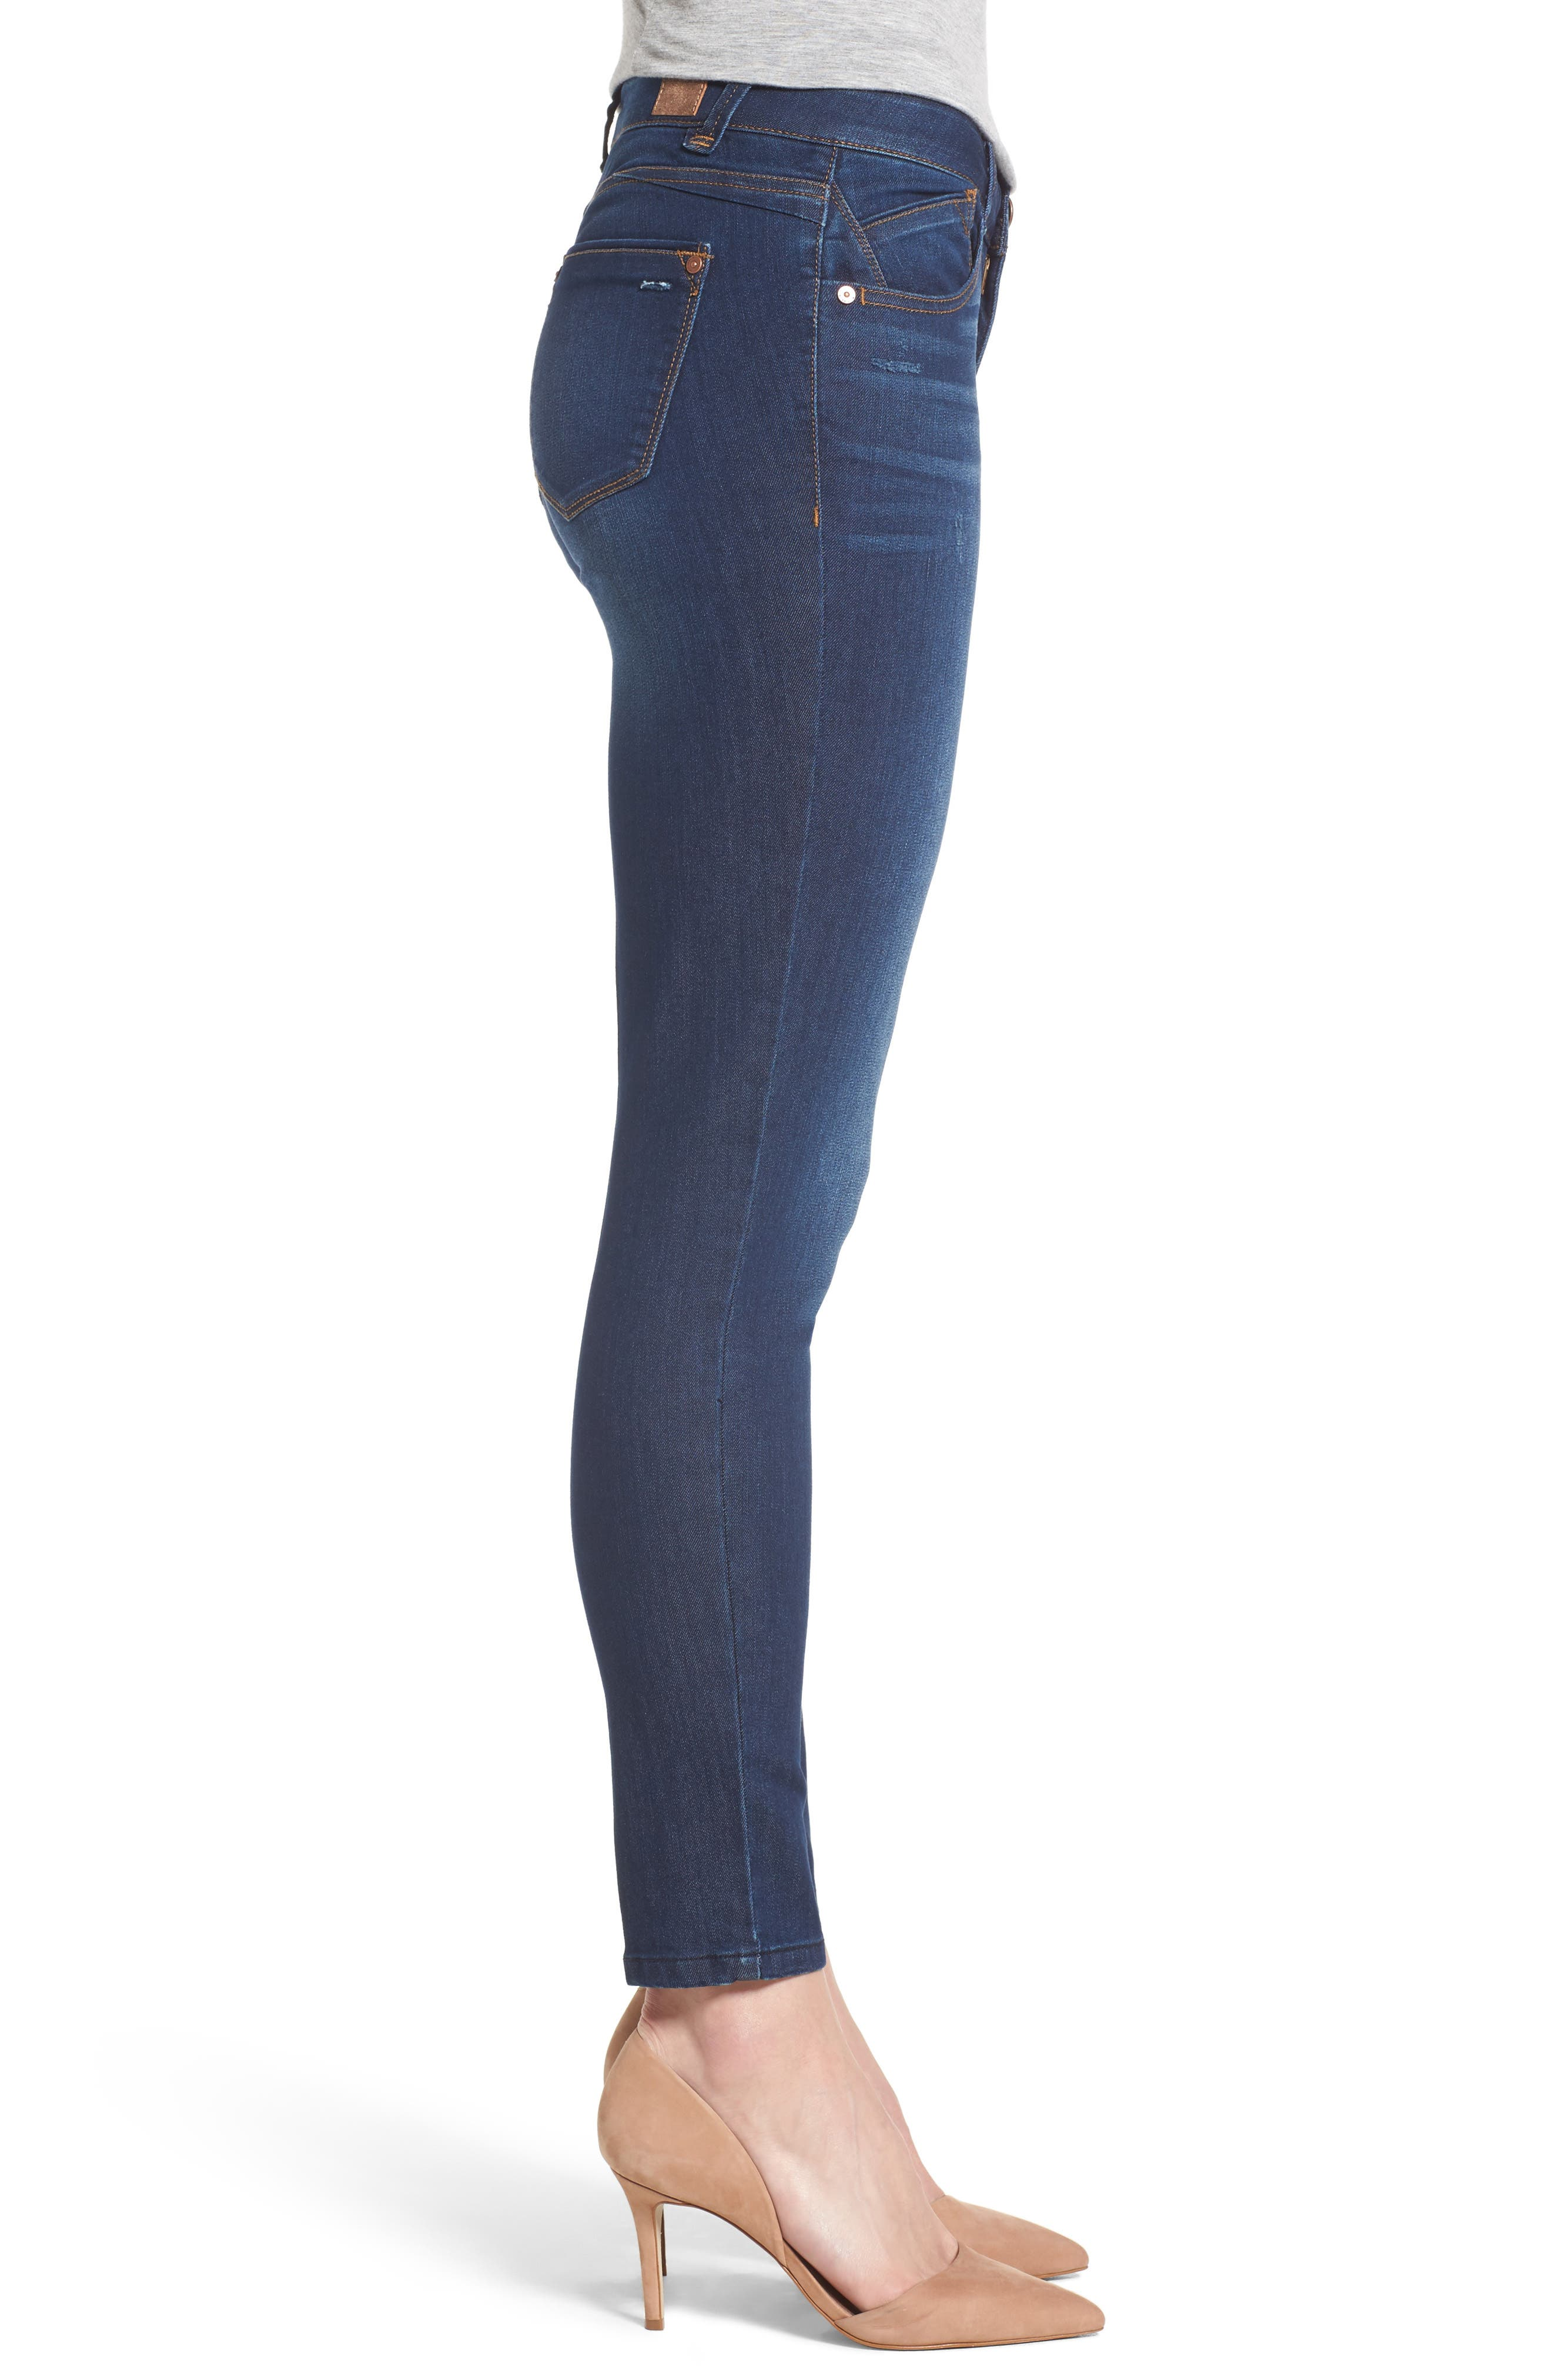 Alternate Image 3  - Wit & Wisdom Skinny Ankle Jeans (Nordstrom Exclusive) (Regular & Petite)